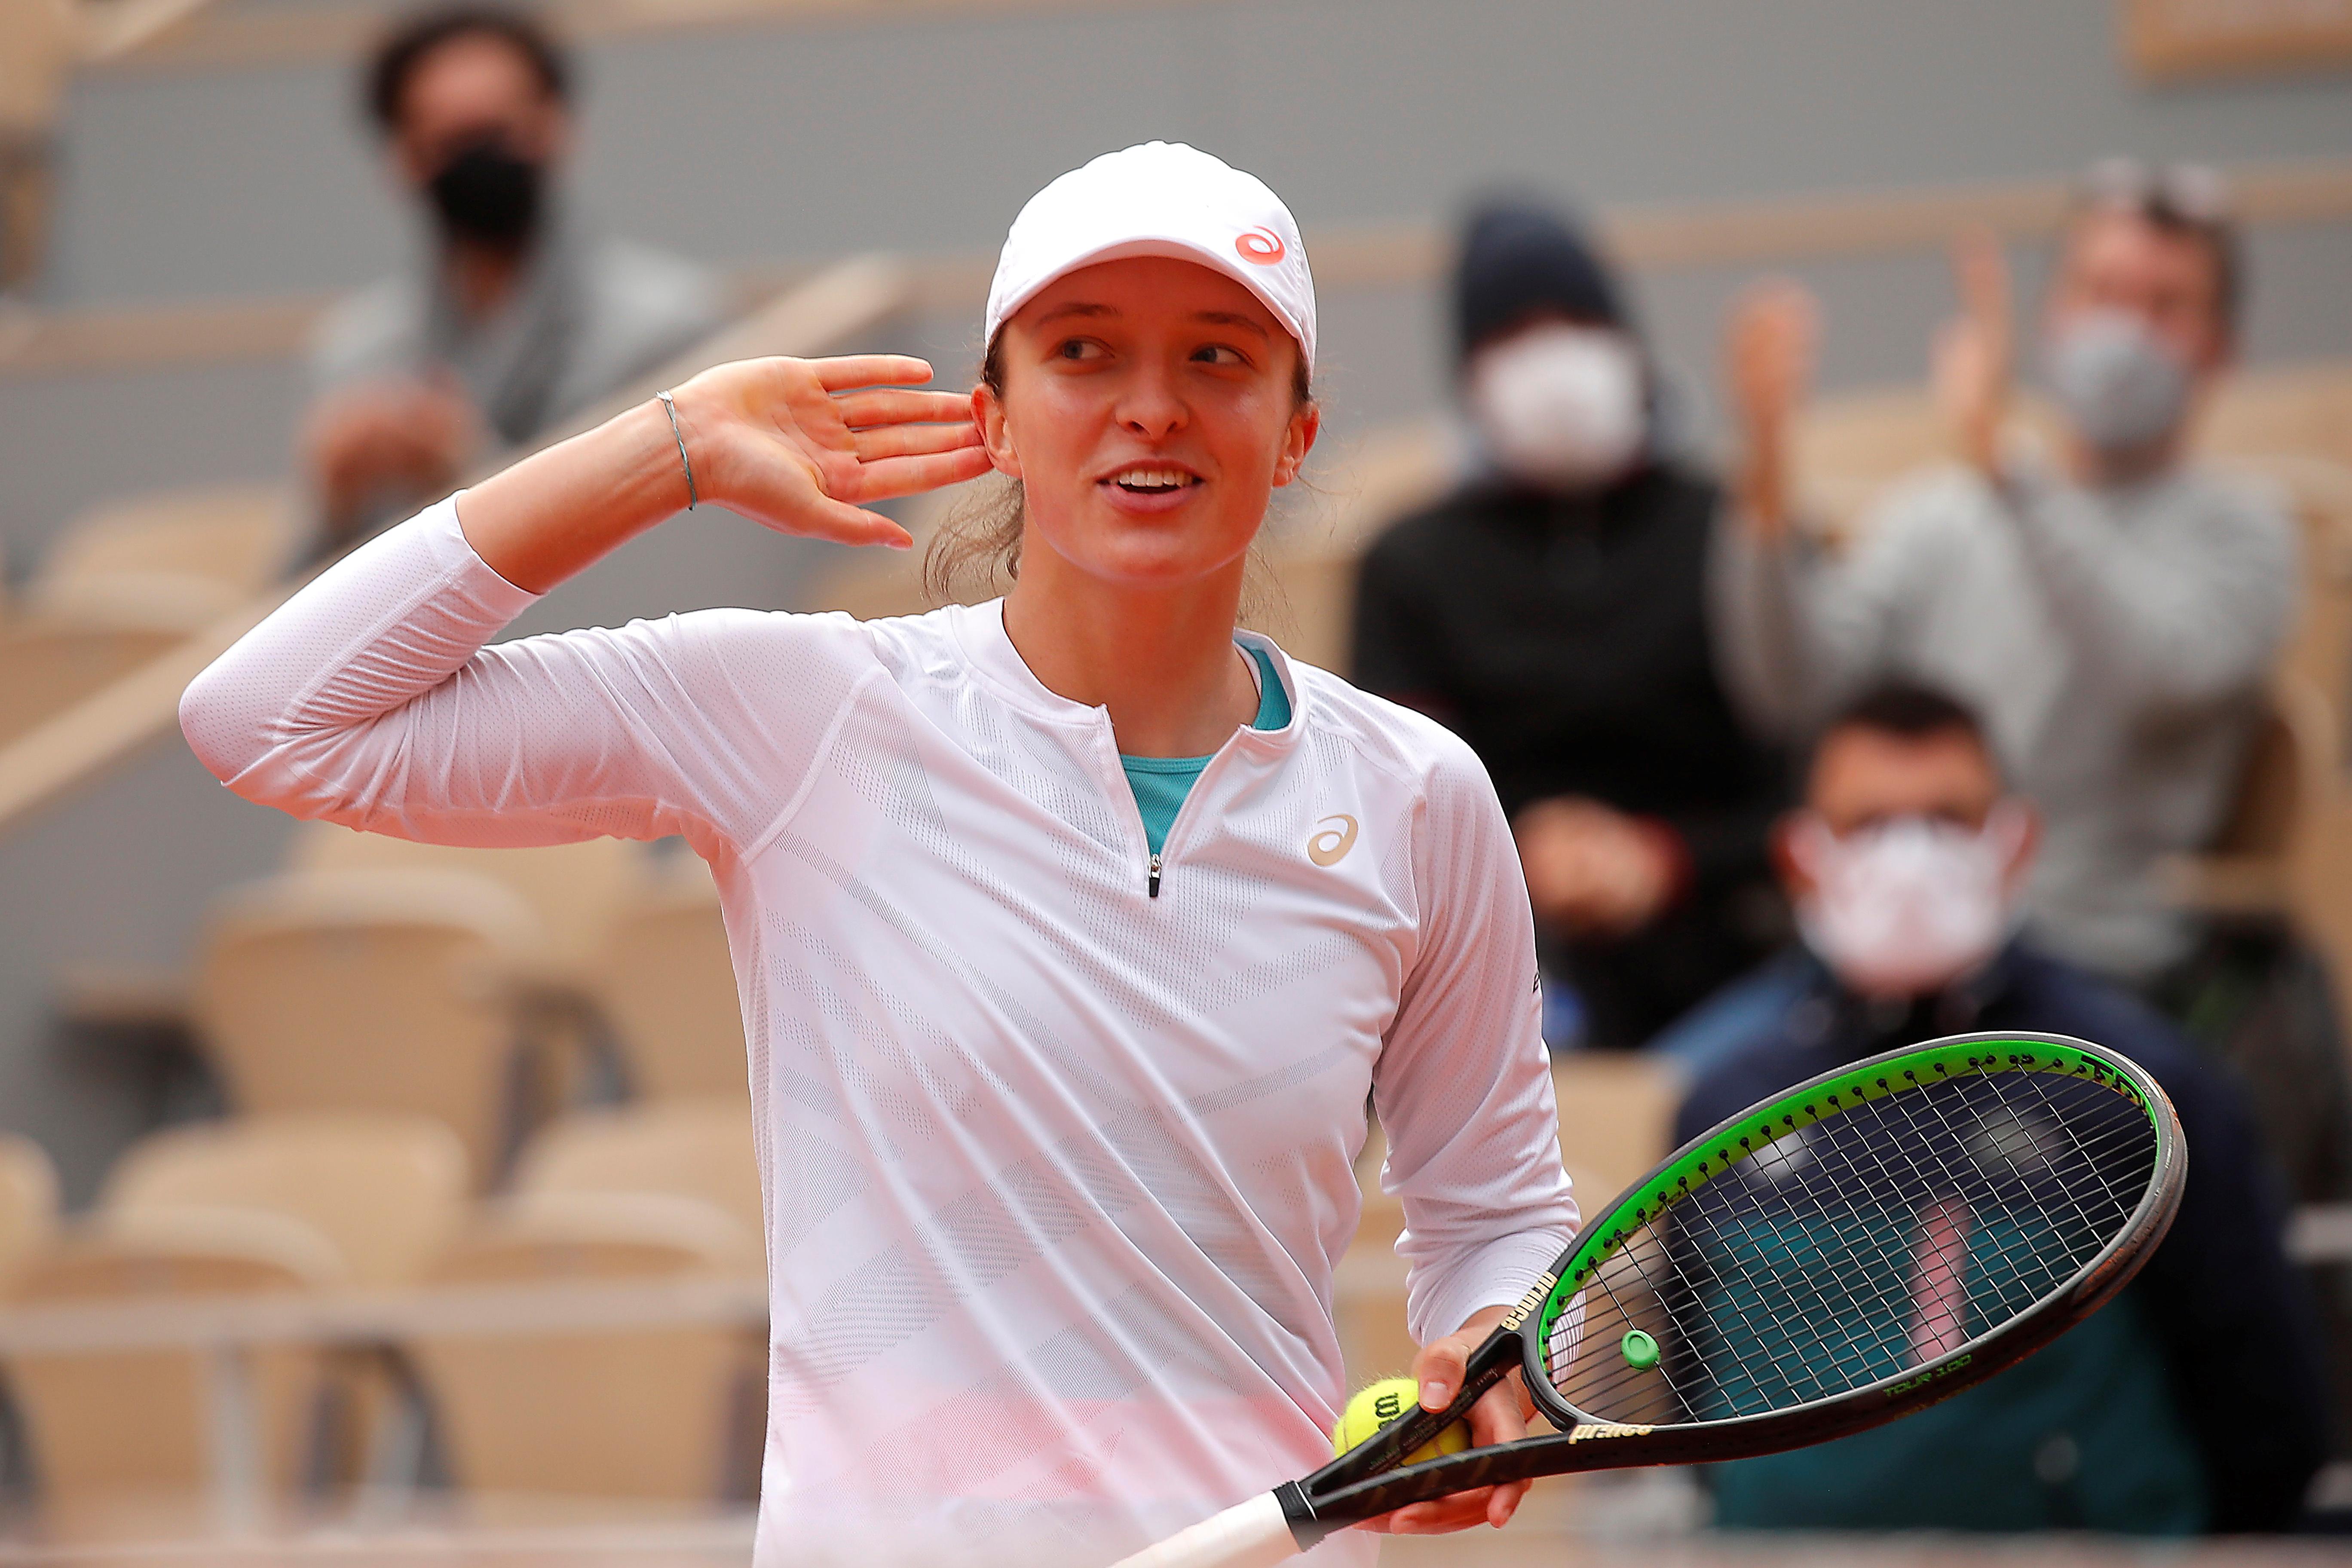 Poland's Iga Swiatek celebrates after winning her semi final match against Argentina's Nadia Podoroska. Photo: Reuters